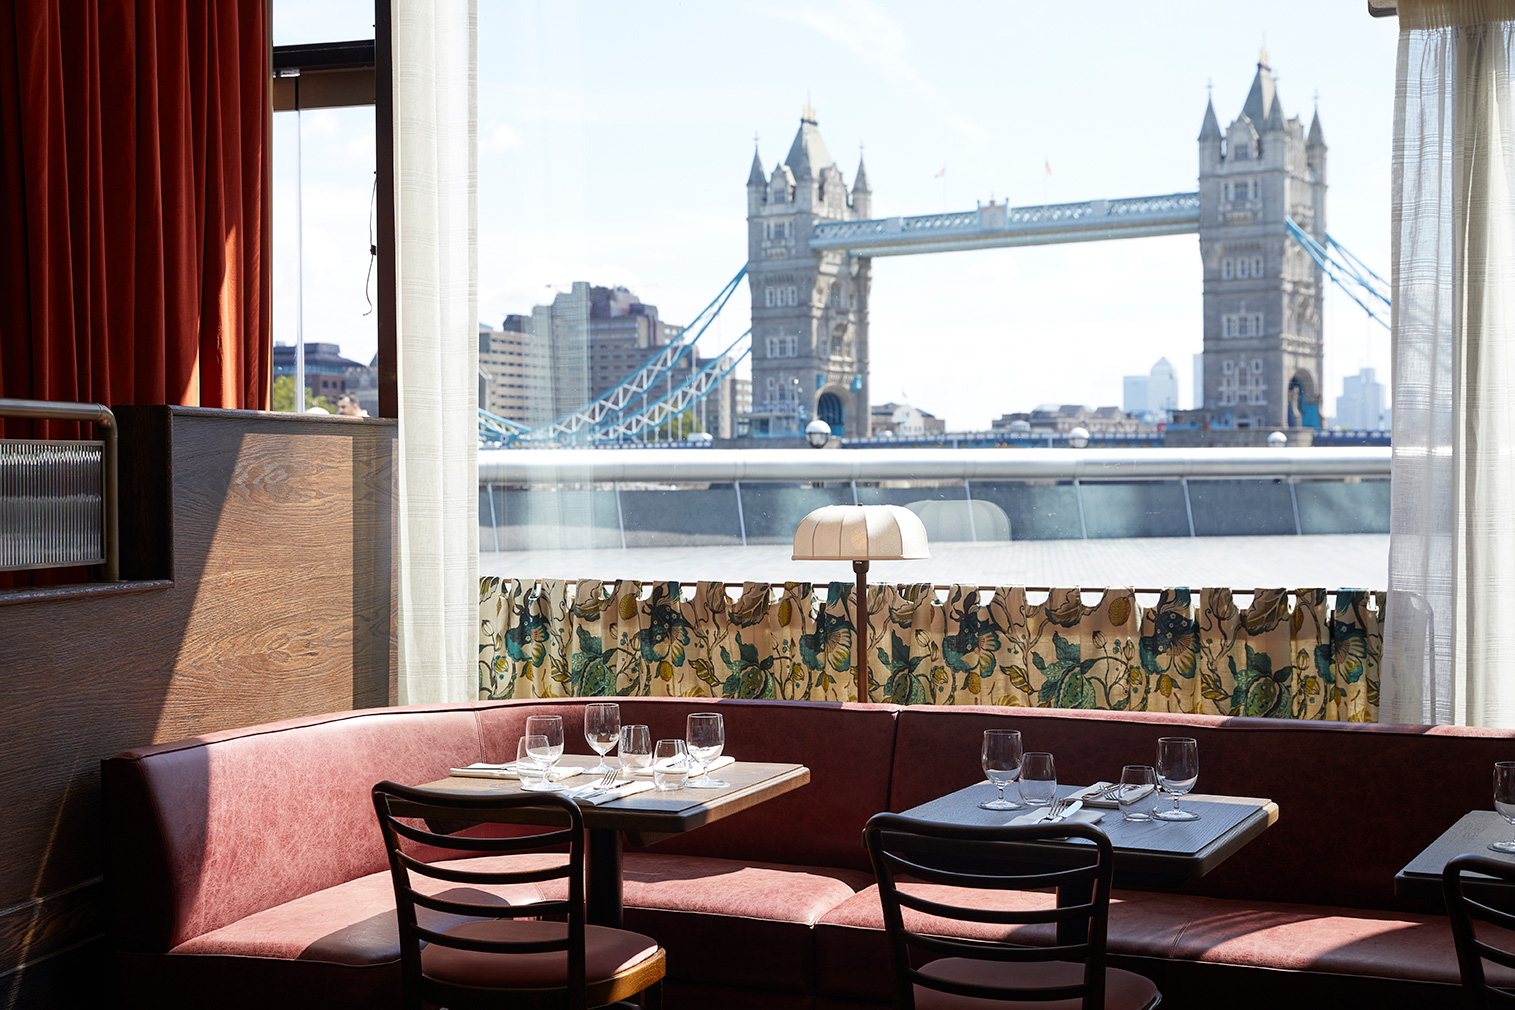 London restaurant Tavolino is a trattoria designed for locals